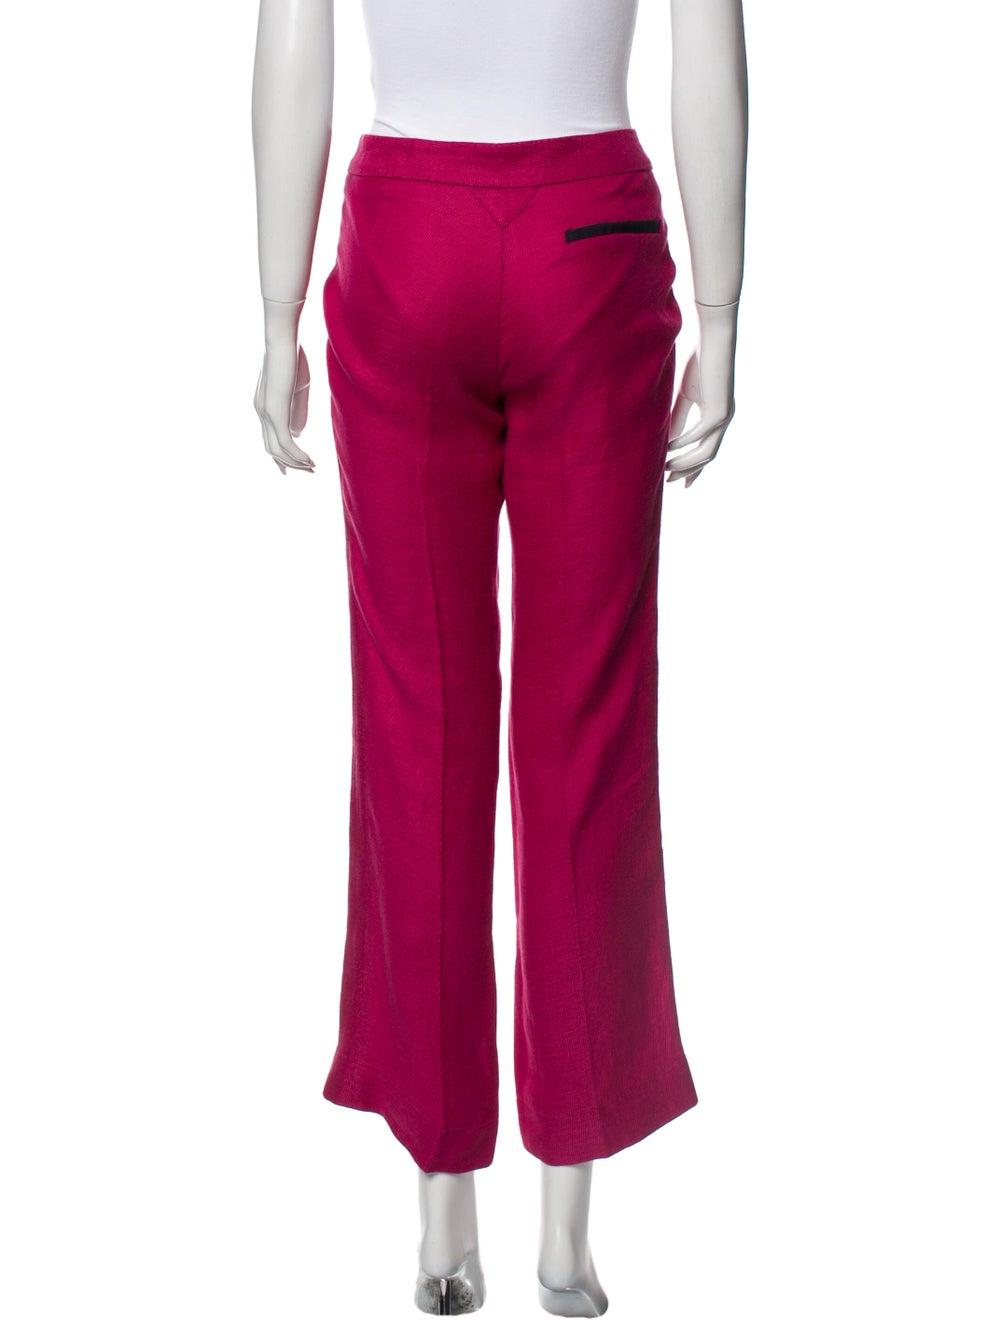 Veronica Beard Linen Wide Leg Pants Pink - image 3